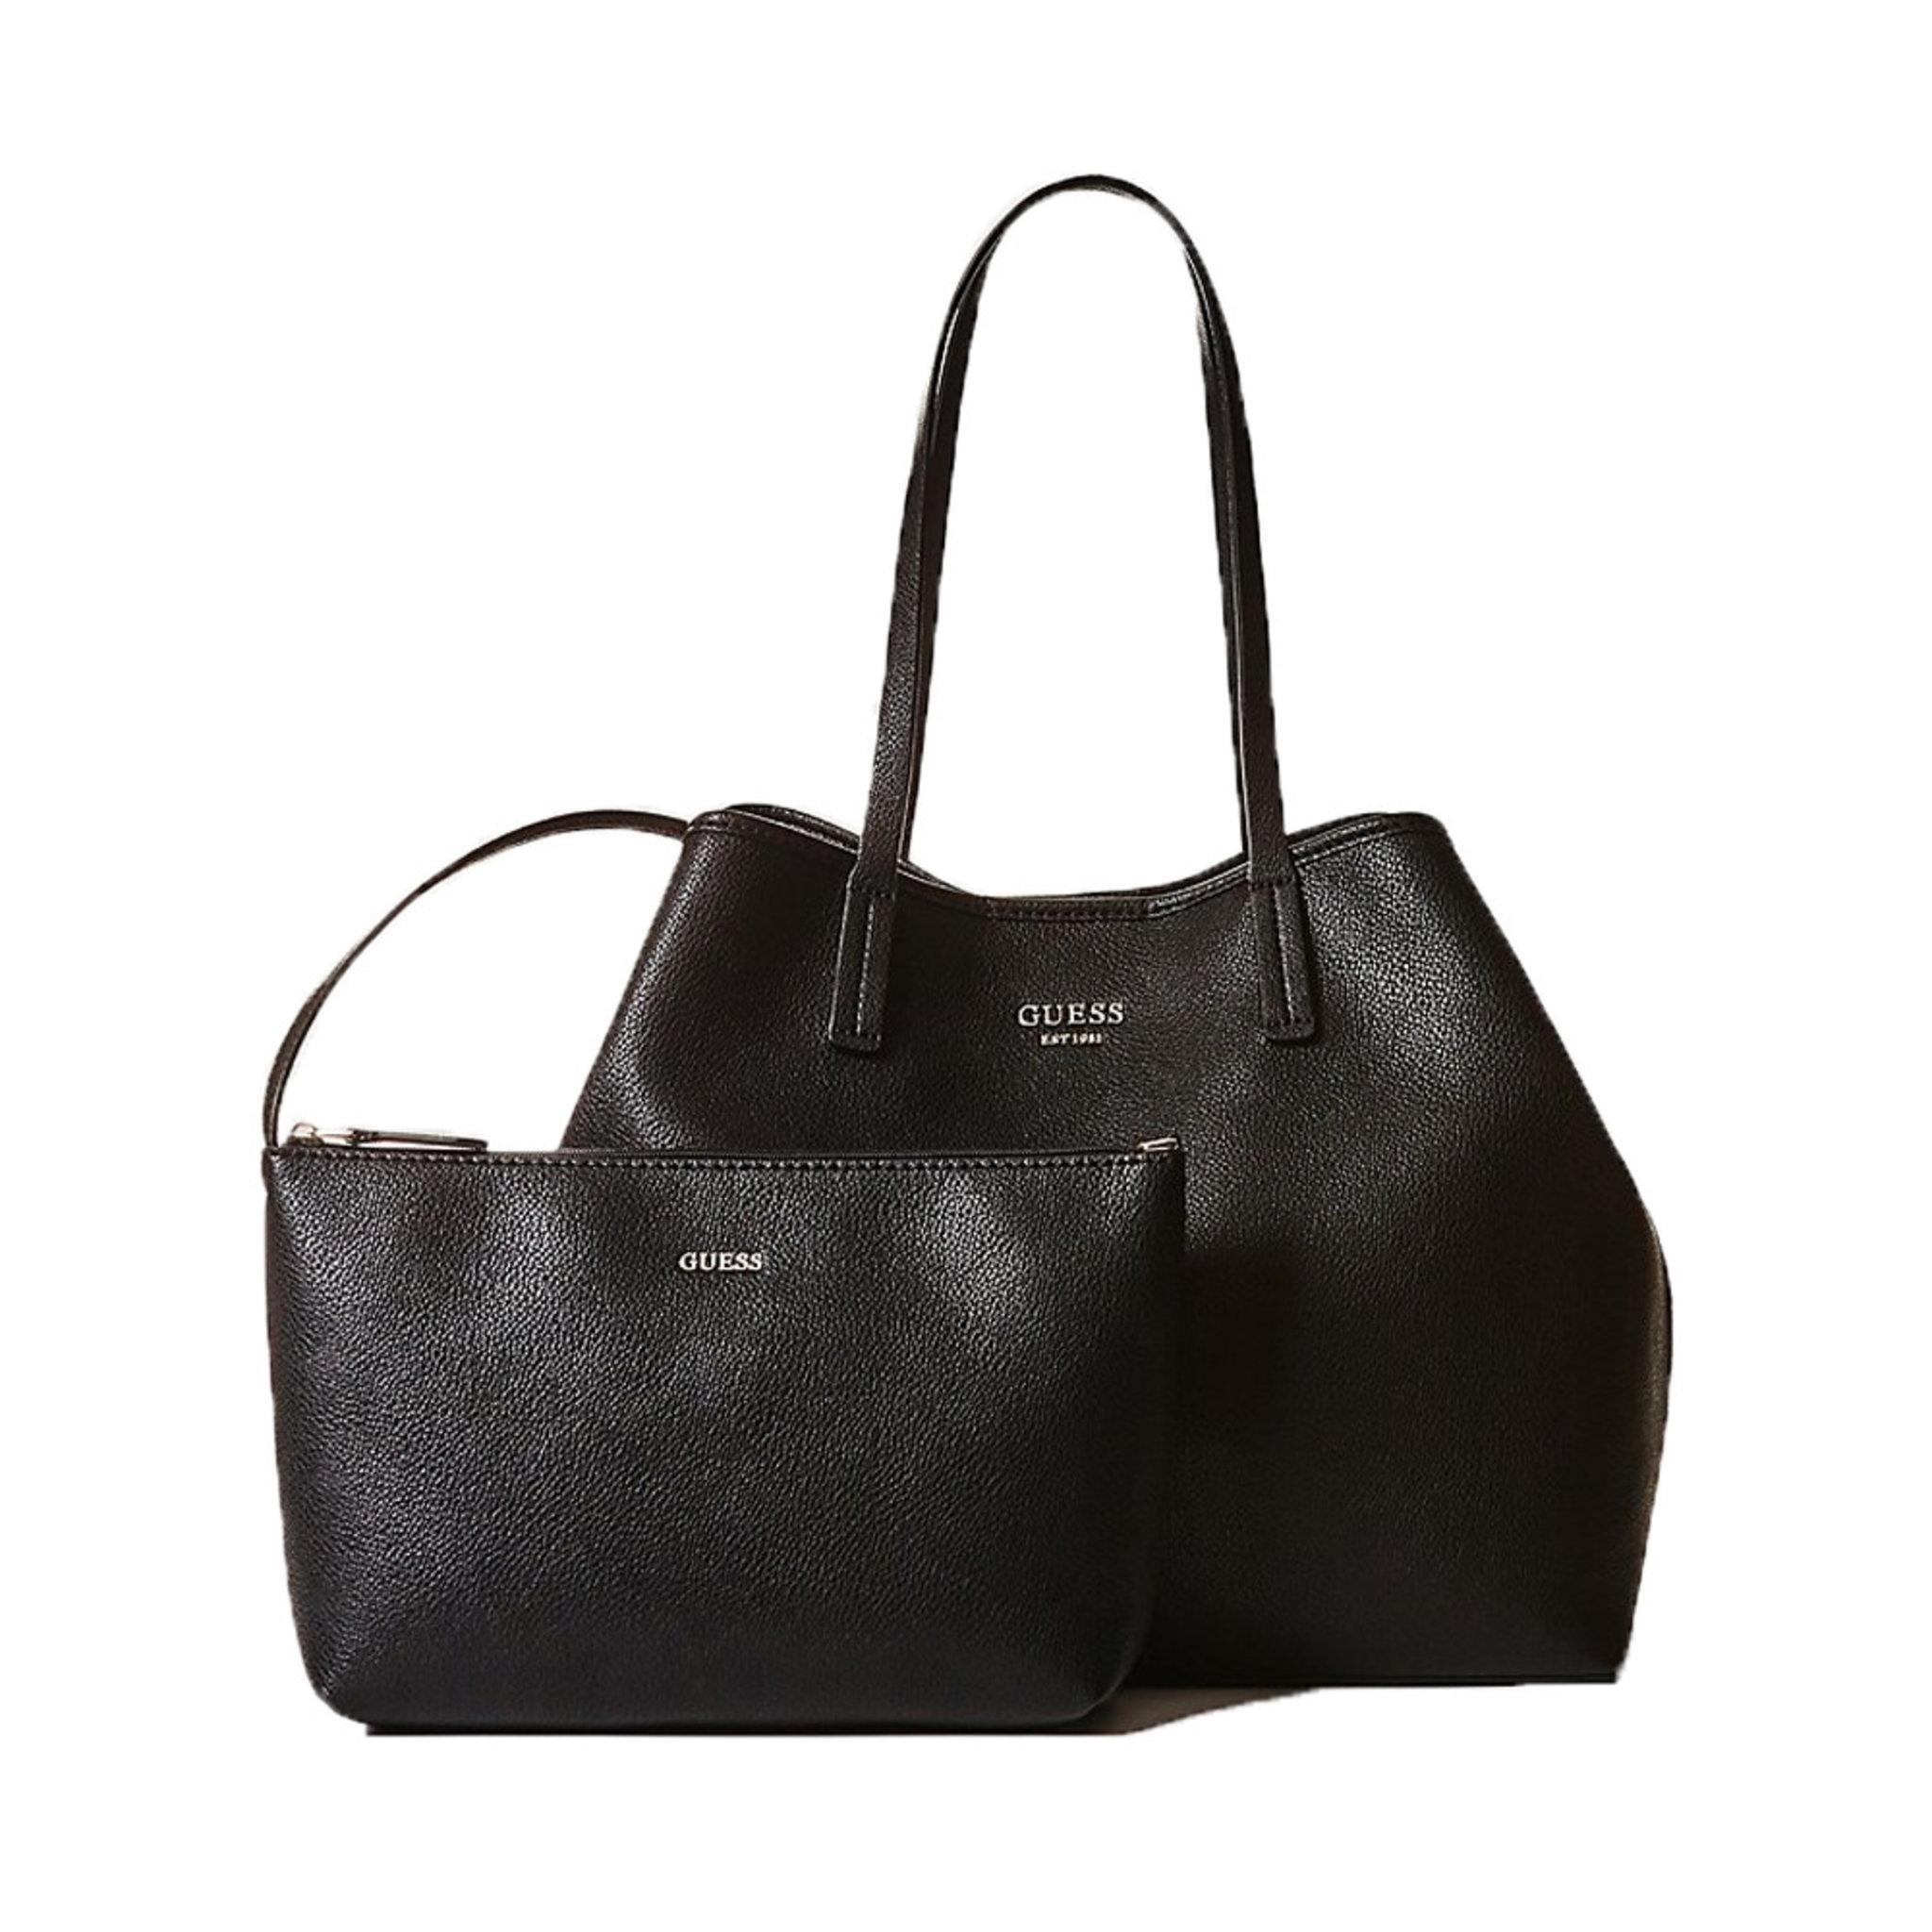 Vikky Handbag Large Tote